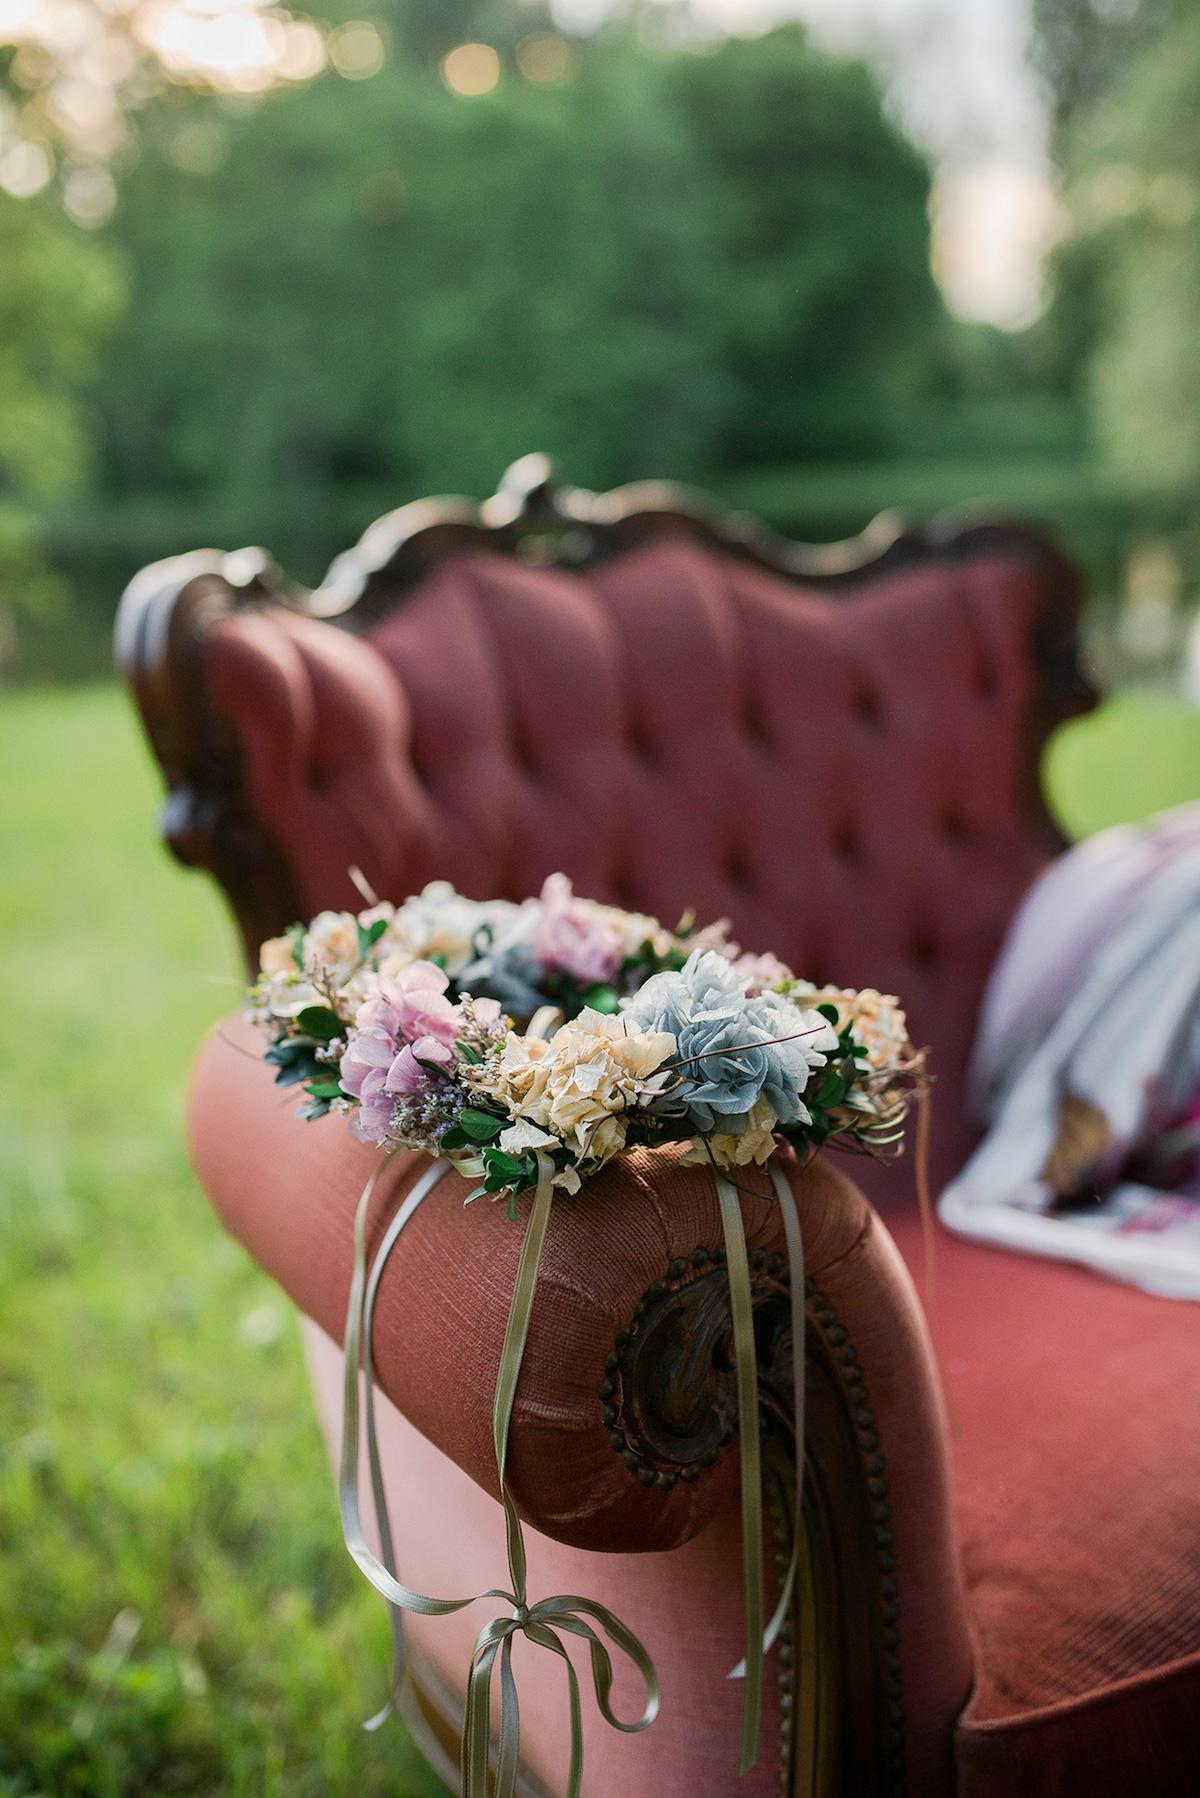 Matrimonio Bohemien Rhapsody : Un matrimonio fiabesco e bohémien wedding wonderland